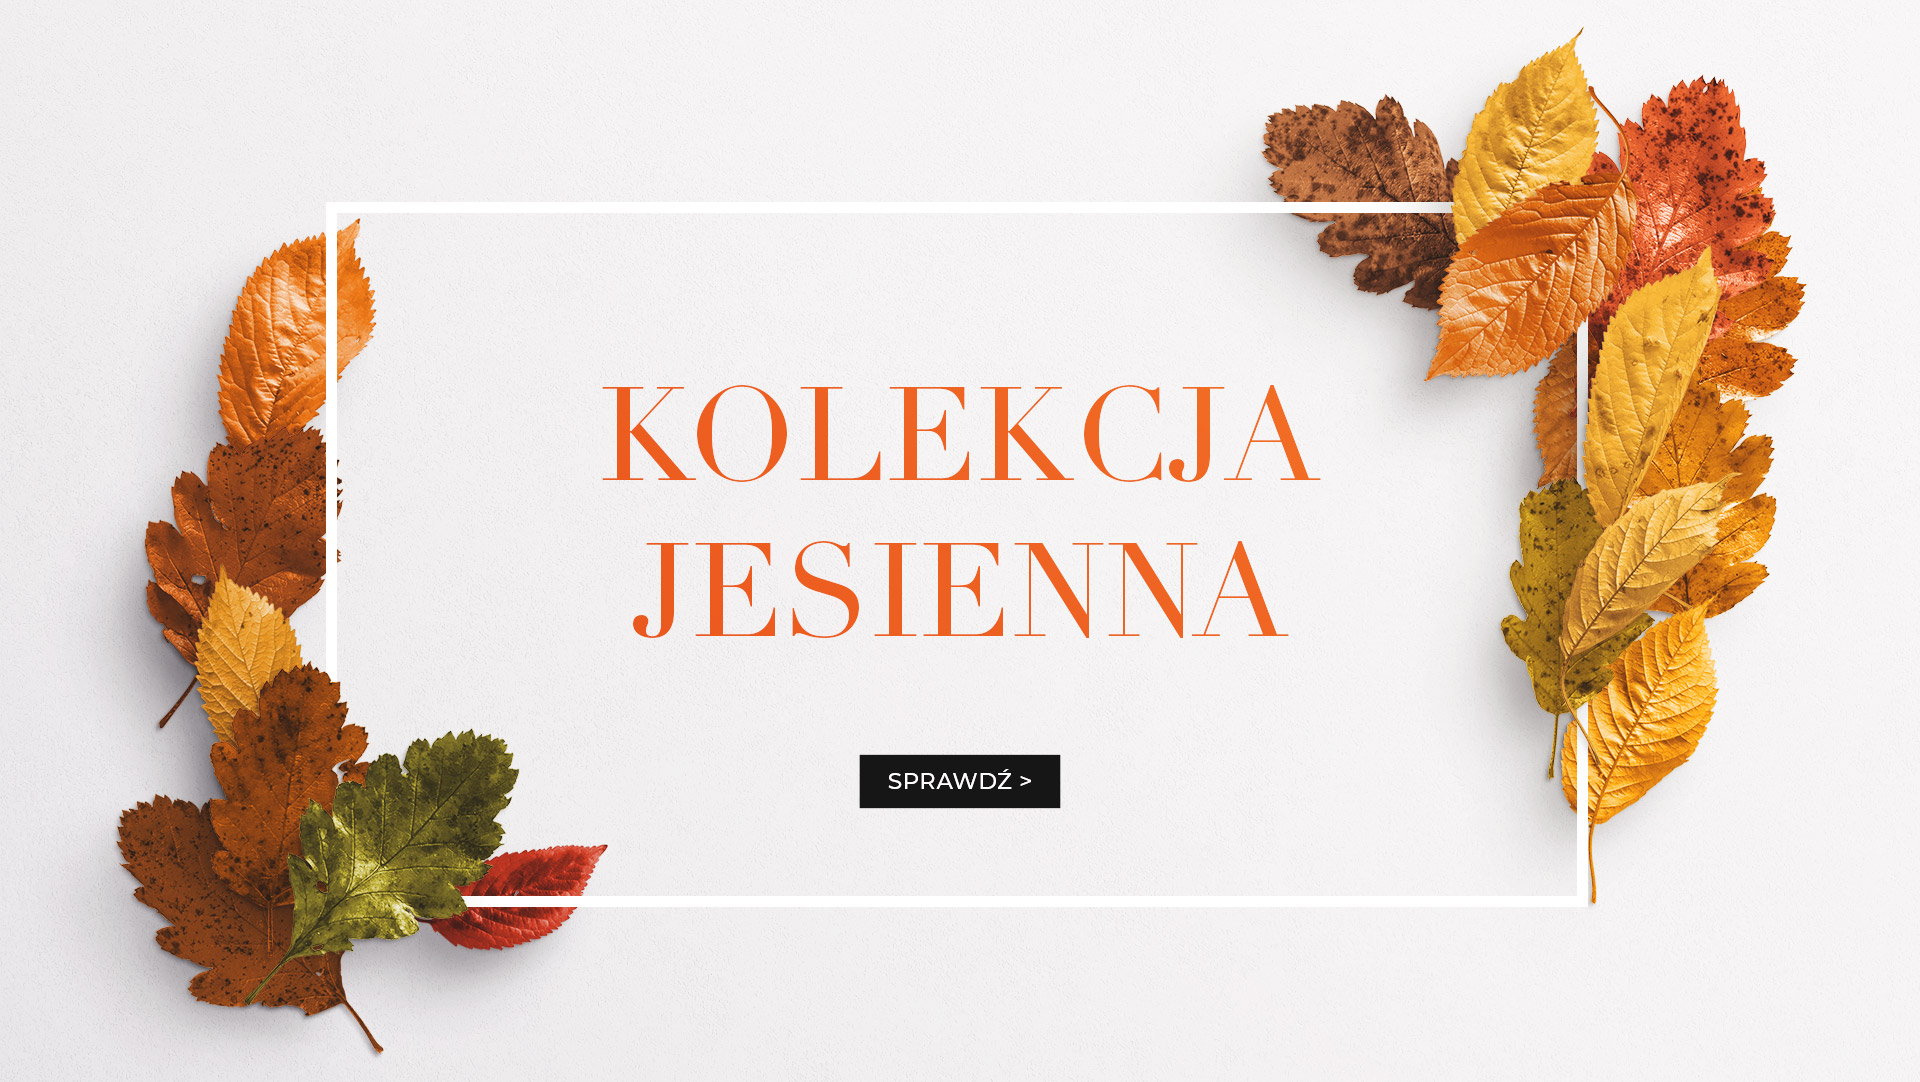 Kolekcja Jesienna